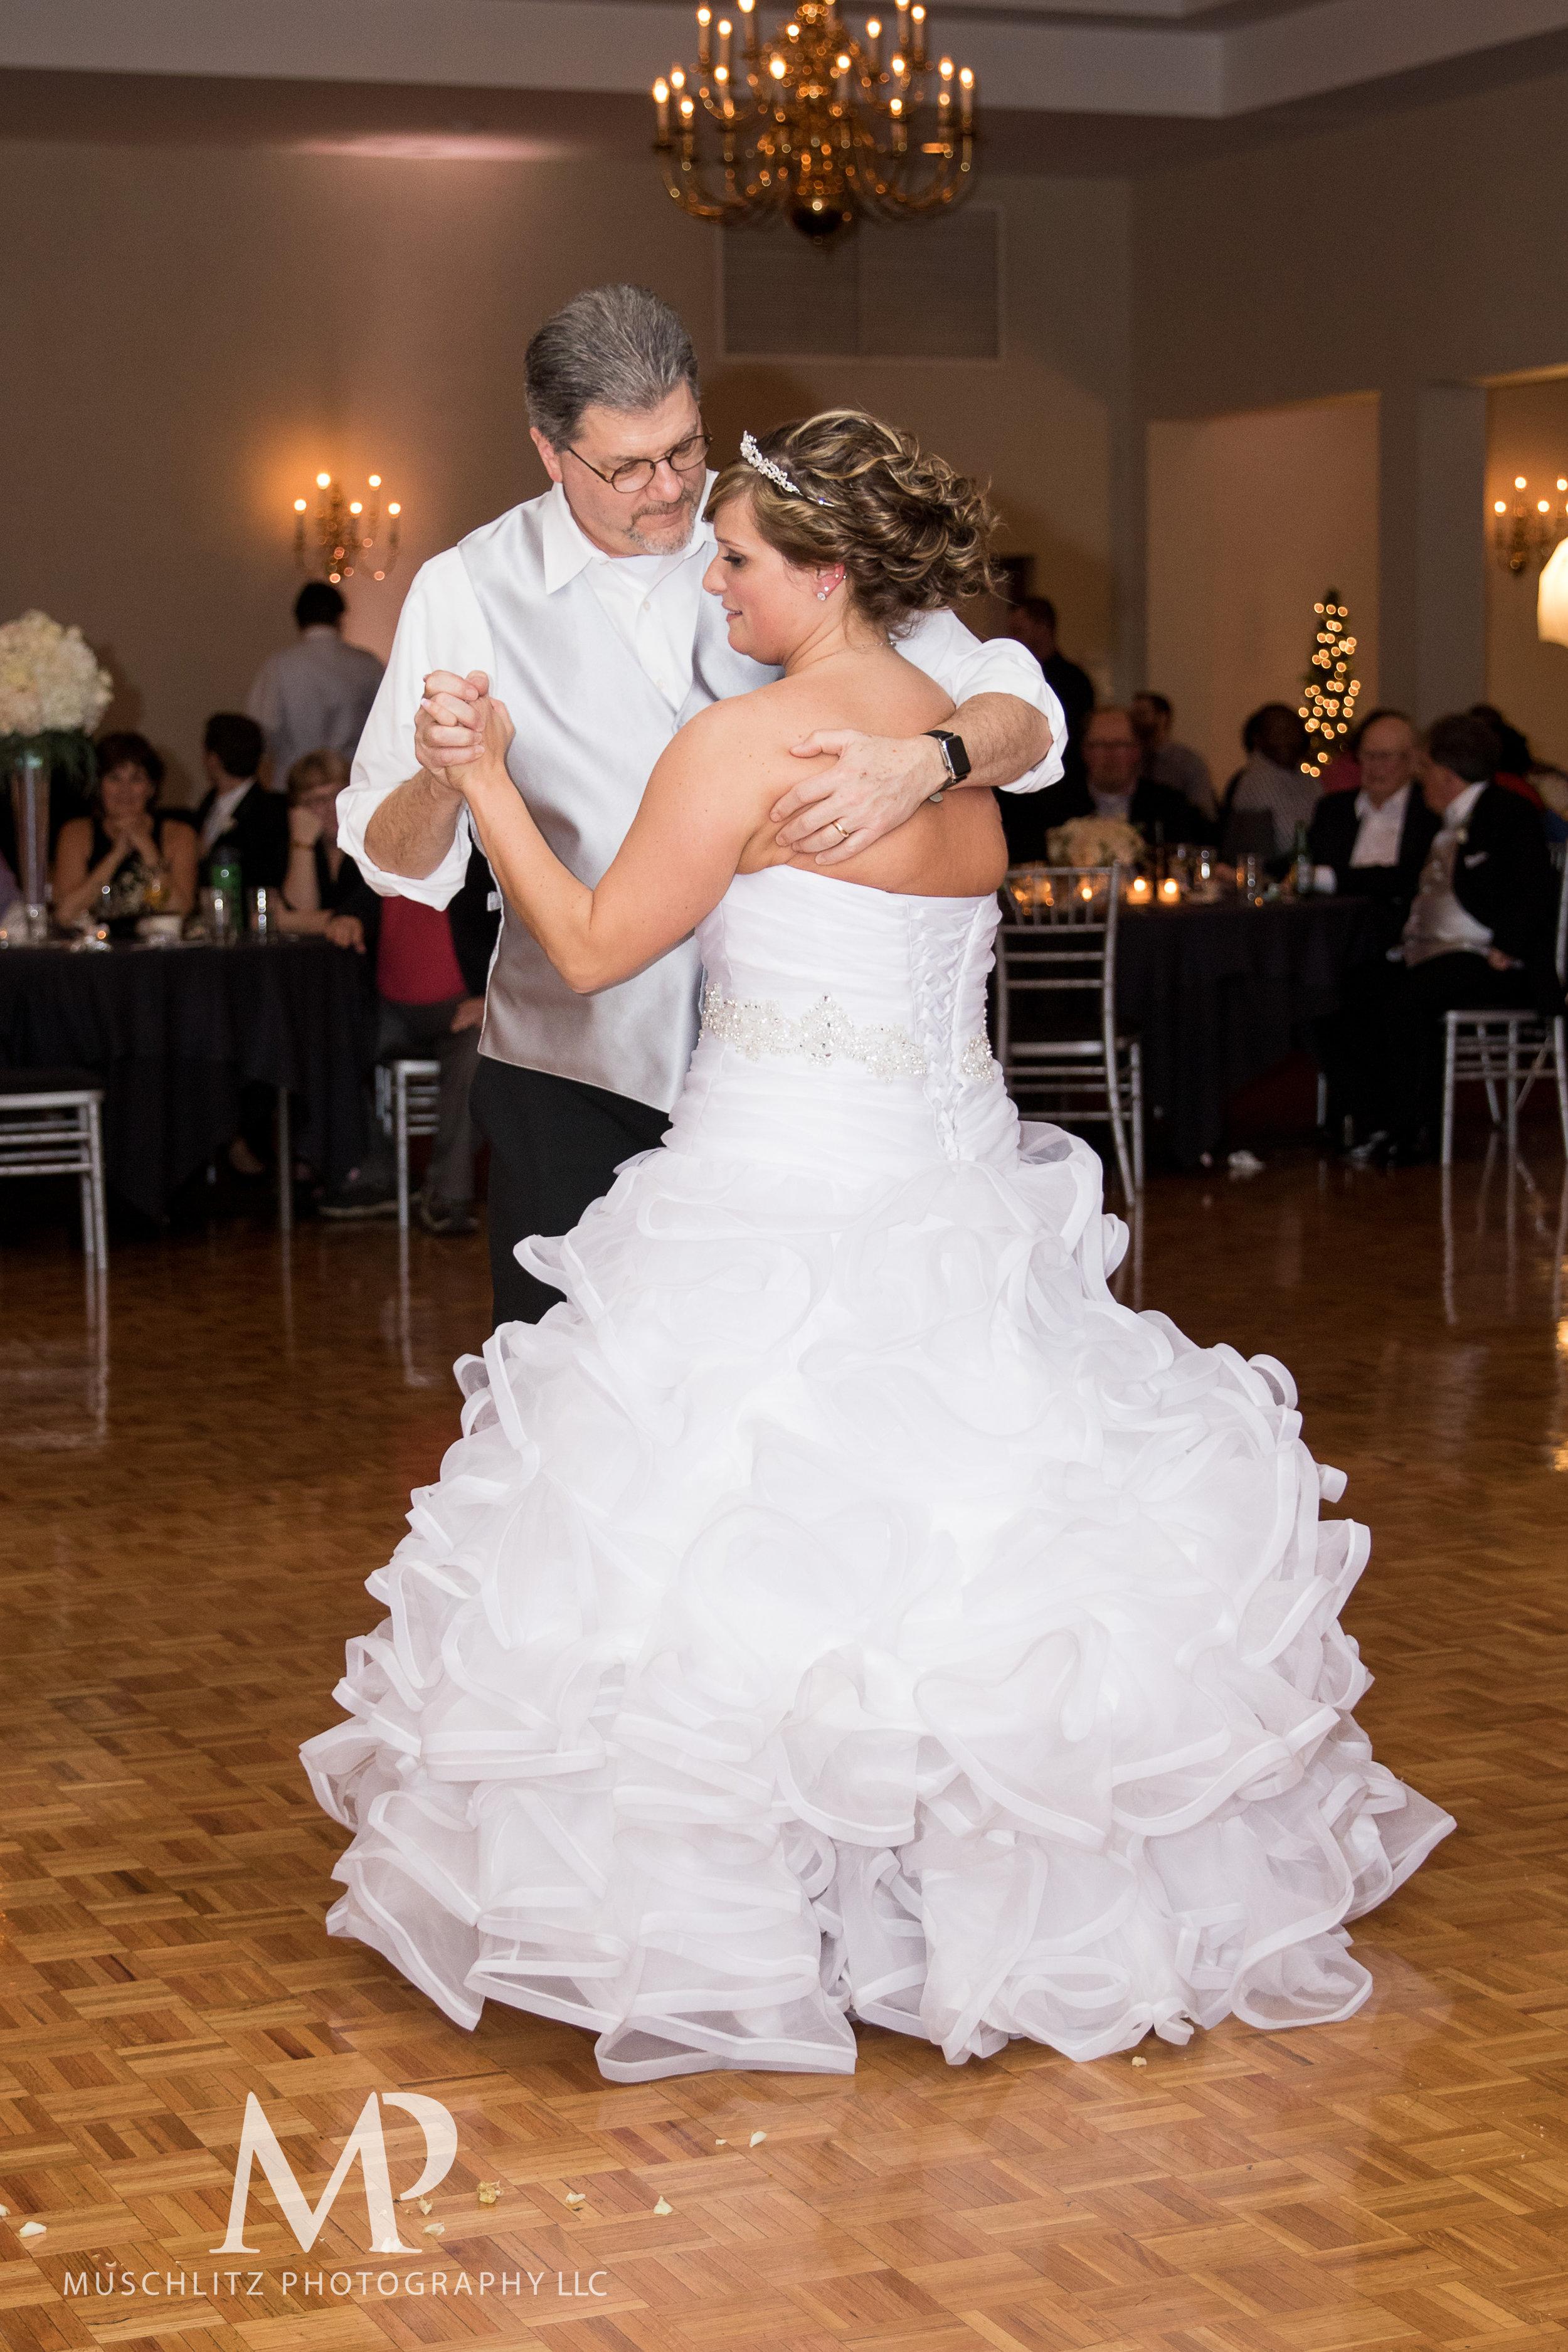 annunciation-banquet-conference-center-downtown-columbus-wedding-reception-downtown-columbus-ohio-muschlitz-photography-023.JPG